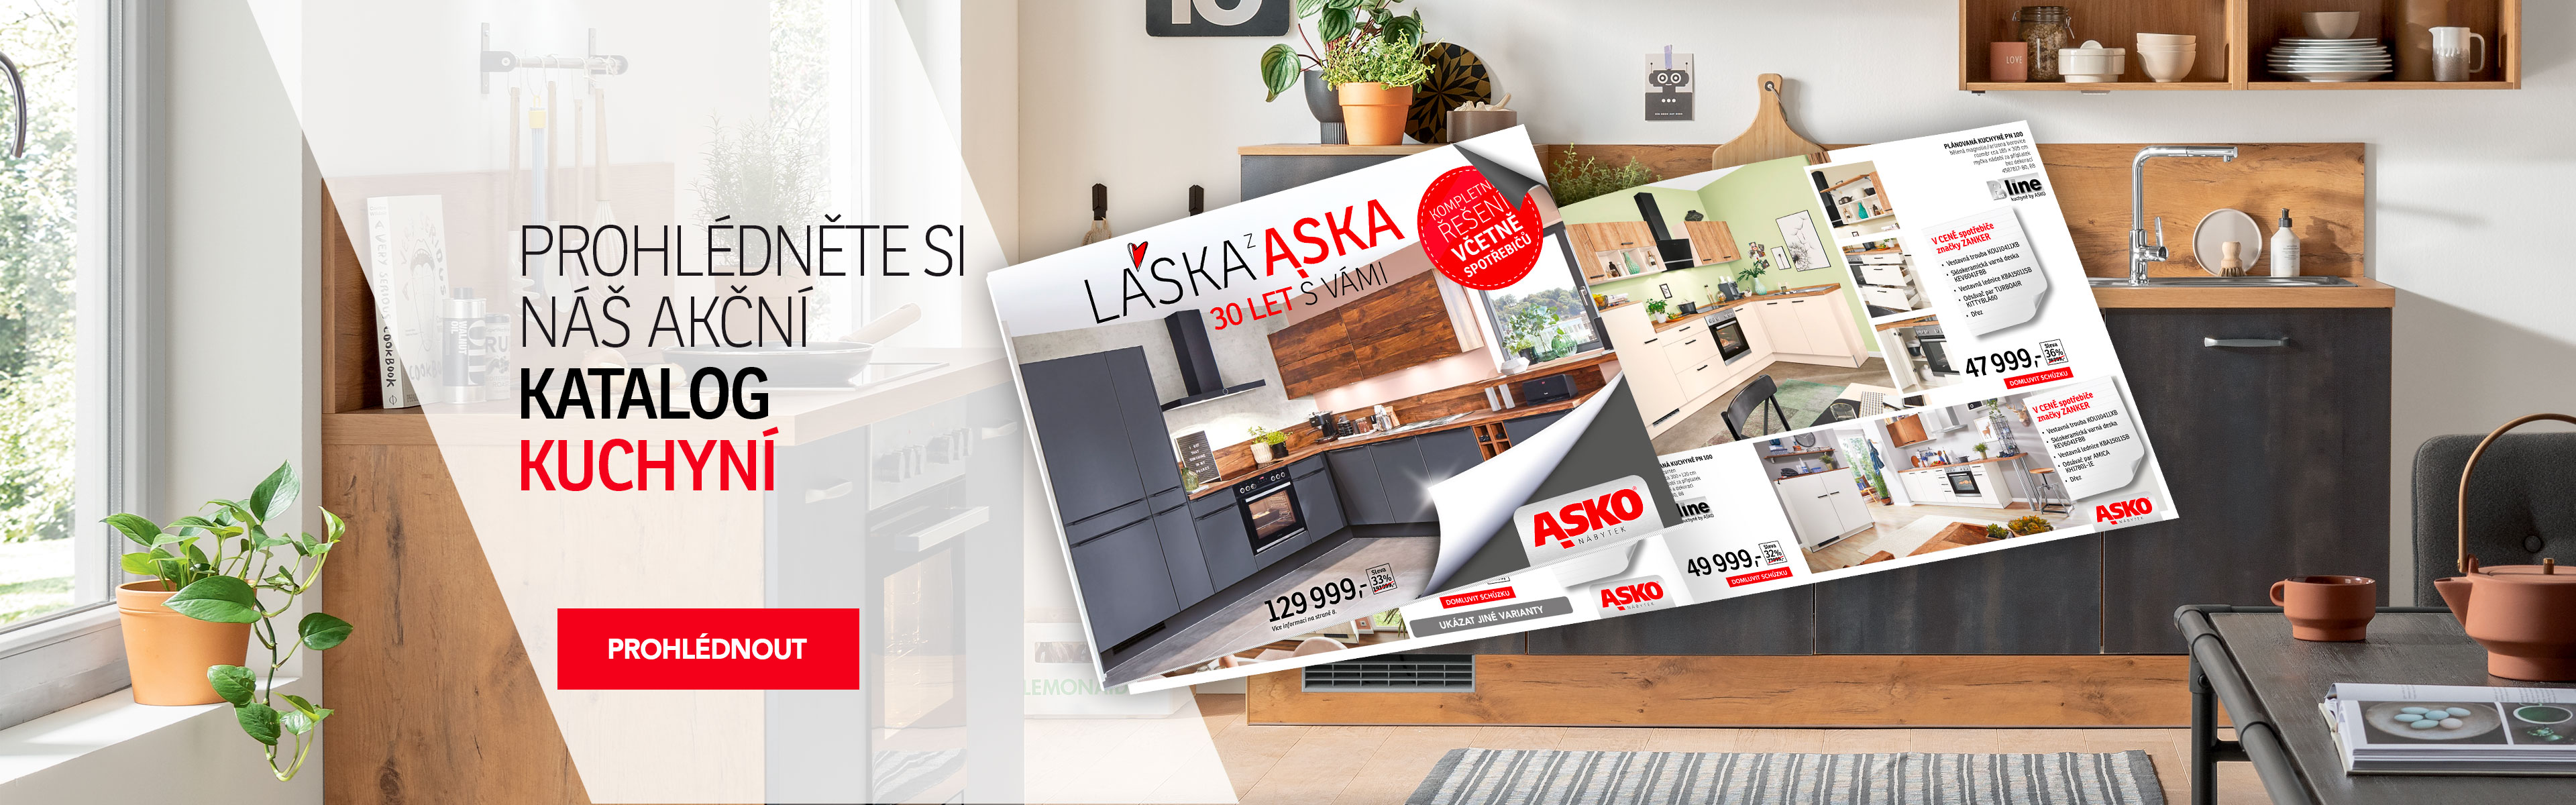 Kuchyně katalog Speciál 2021